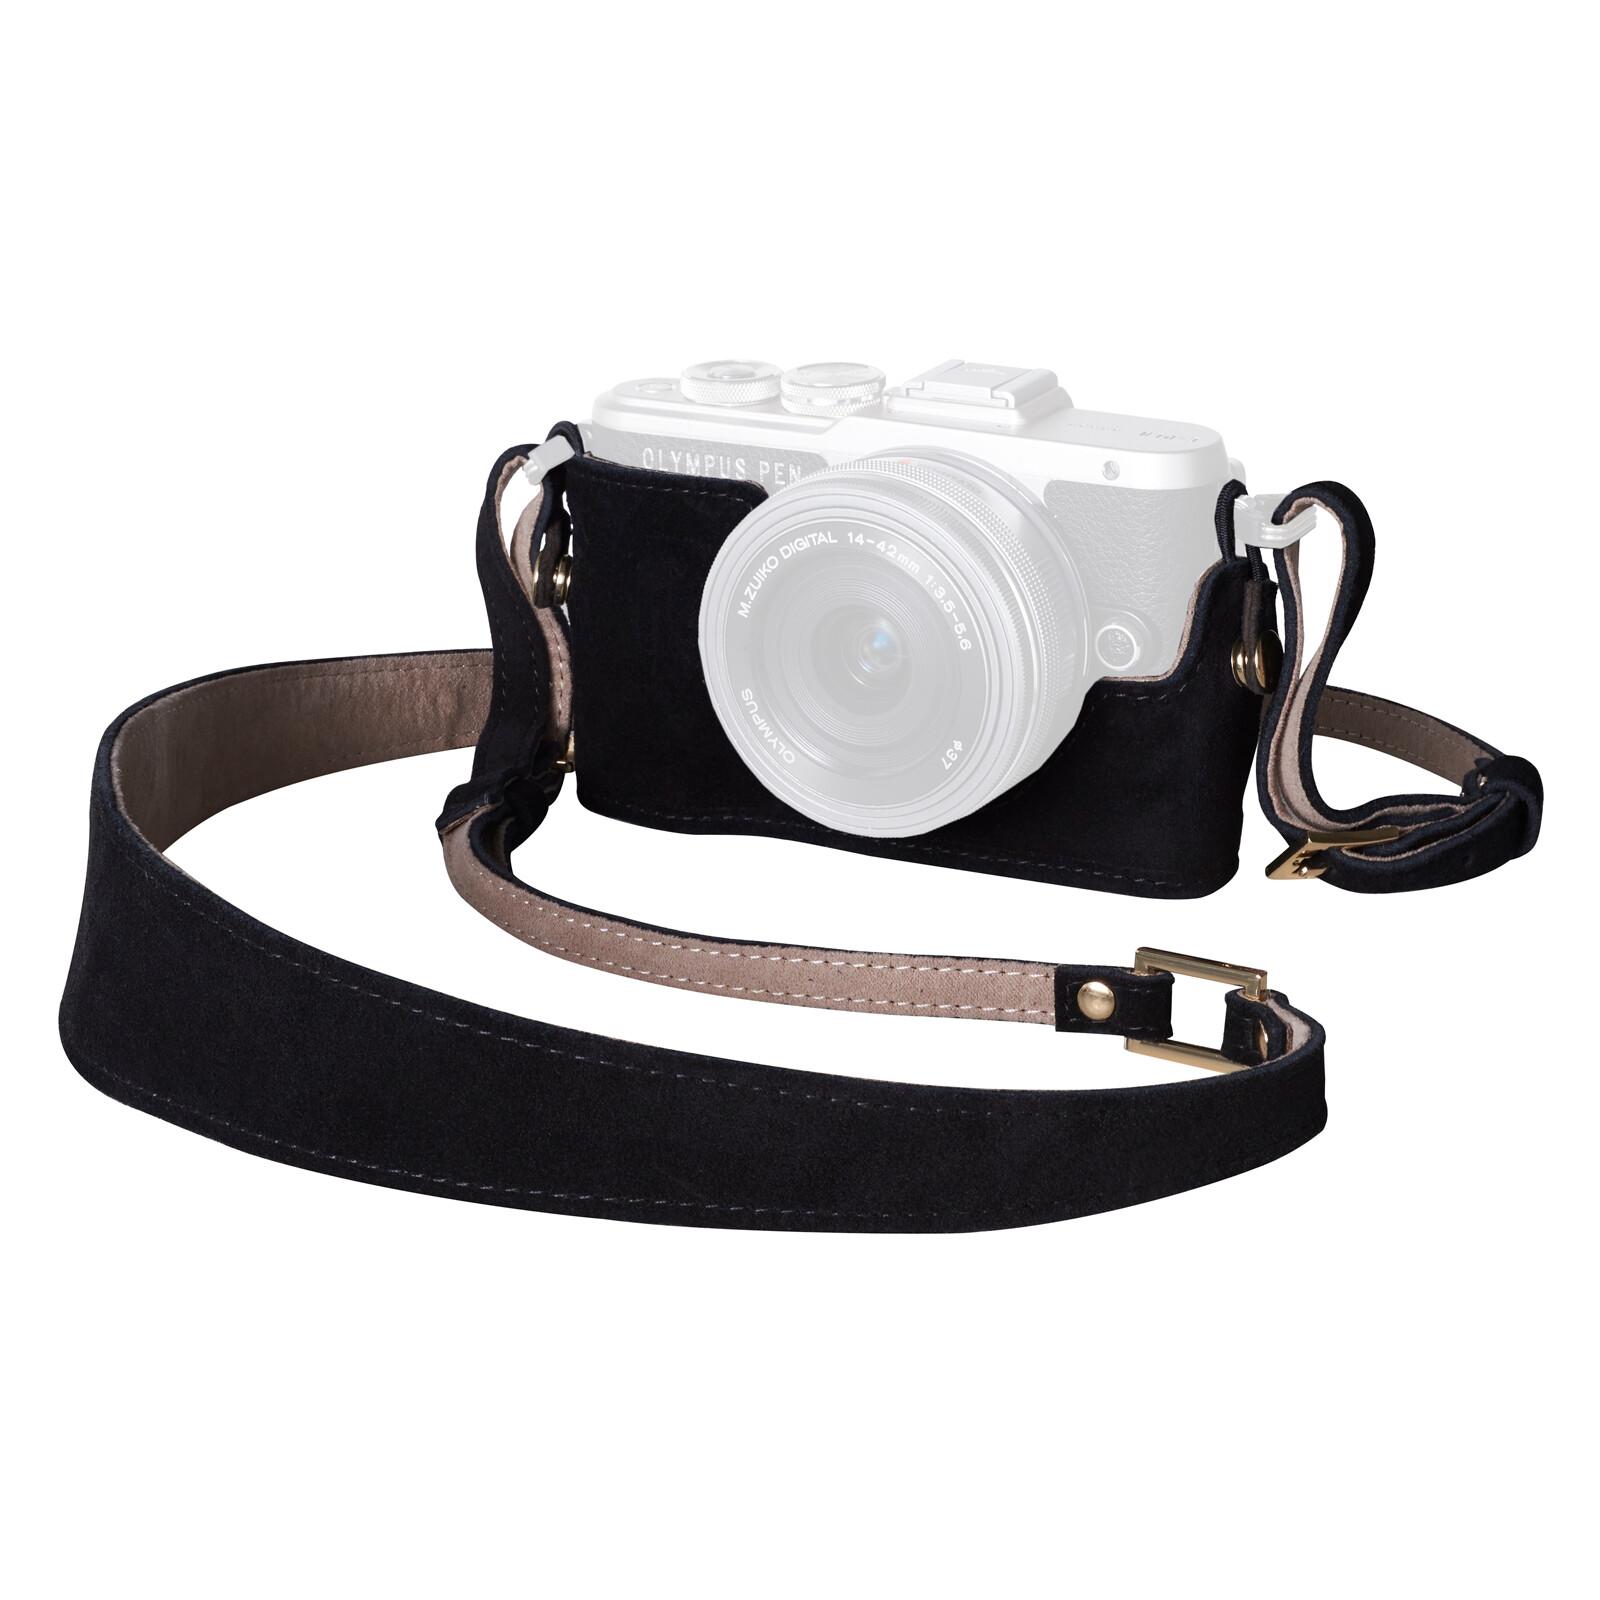 Olympus PEN Kamera Outfit